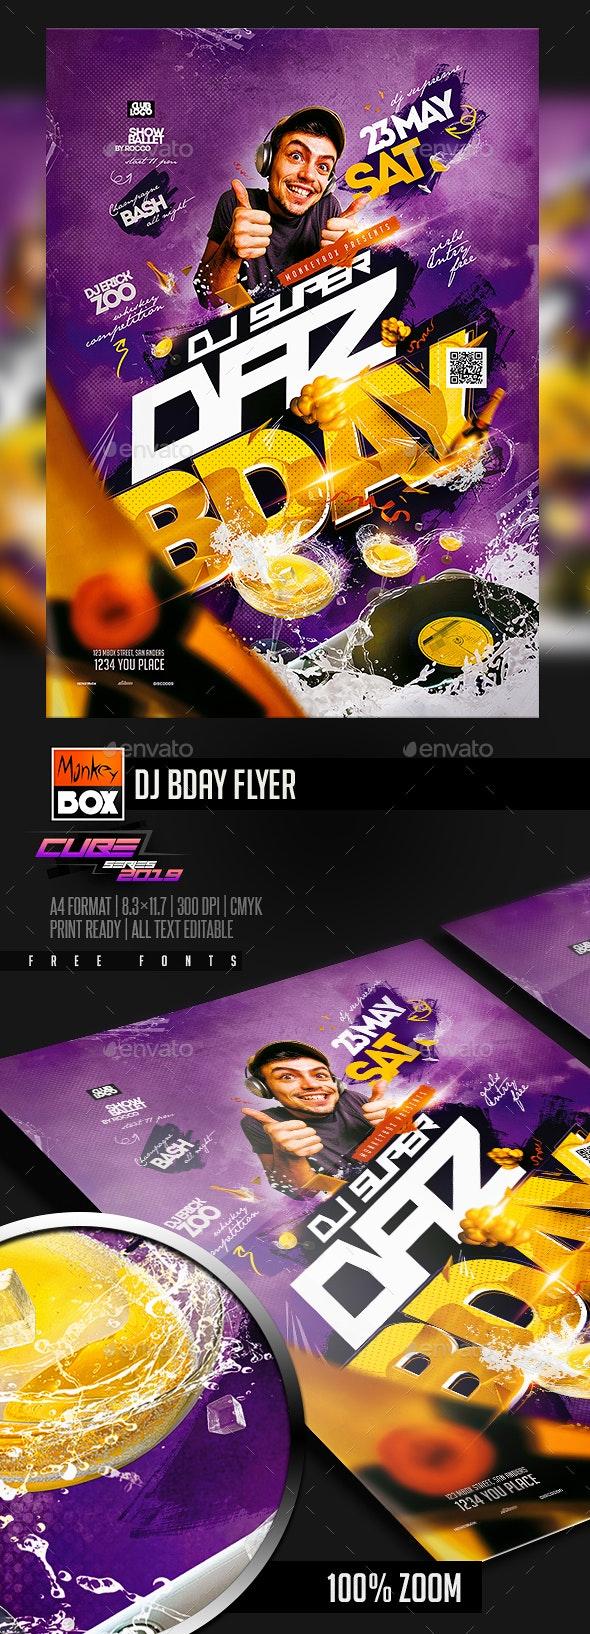 Dj Bday Flyer - Clubs & Parties Events